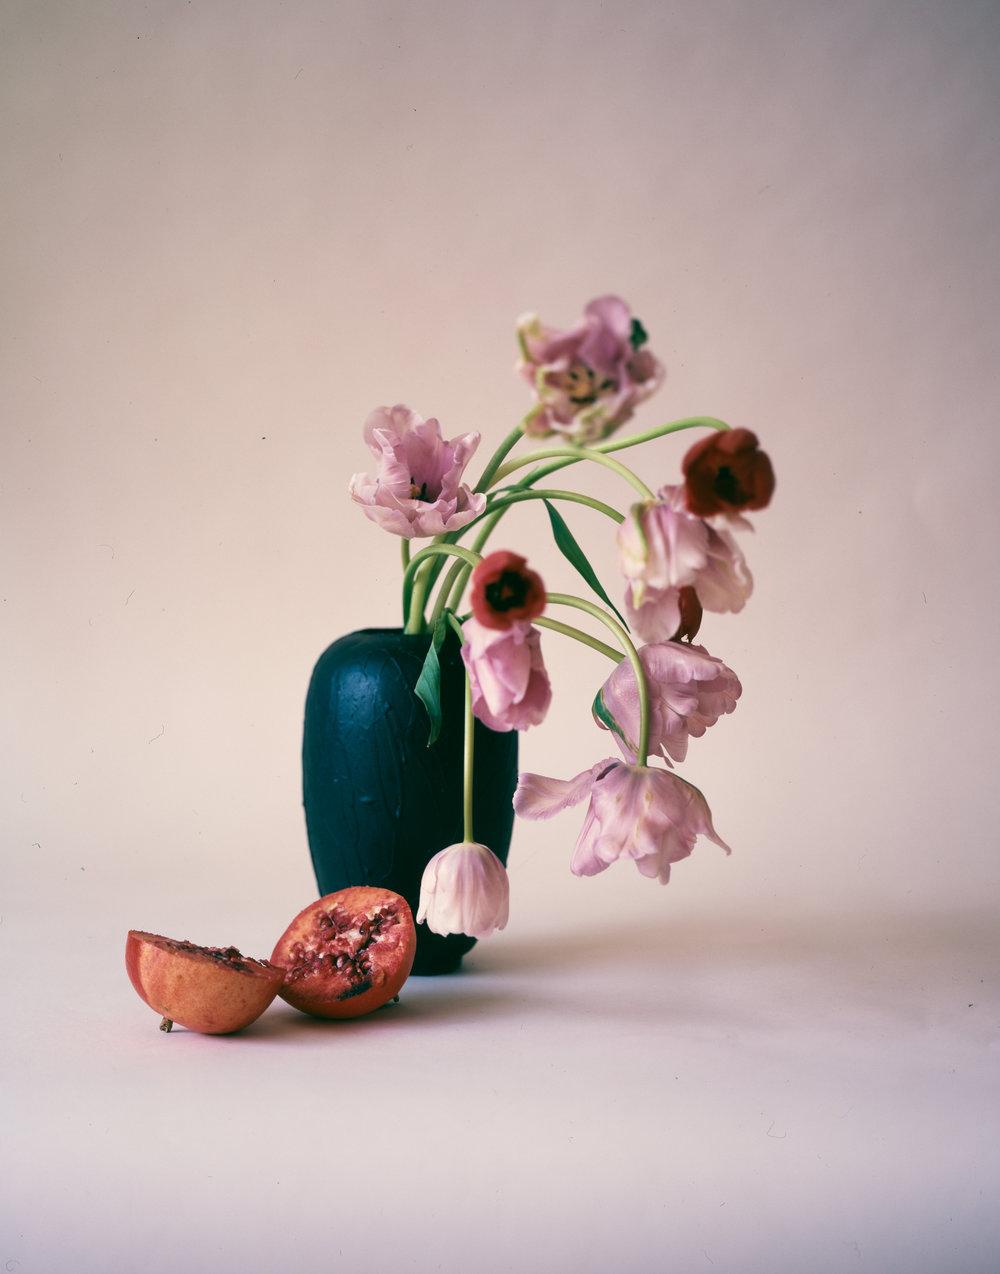 Darling & Daughters Charlottesville, Richmond, Florist, Custom Flowers, Wedding Design, Maryland, Baltimore, Events, Monthly, Flower Tintins Kathy Akey Collaboration4.jpg